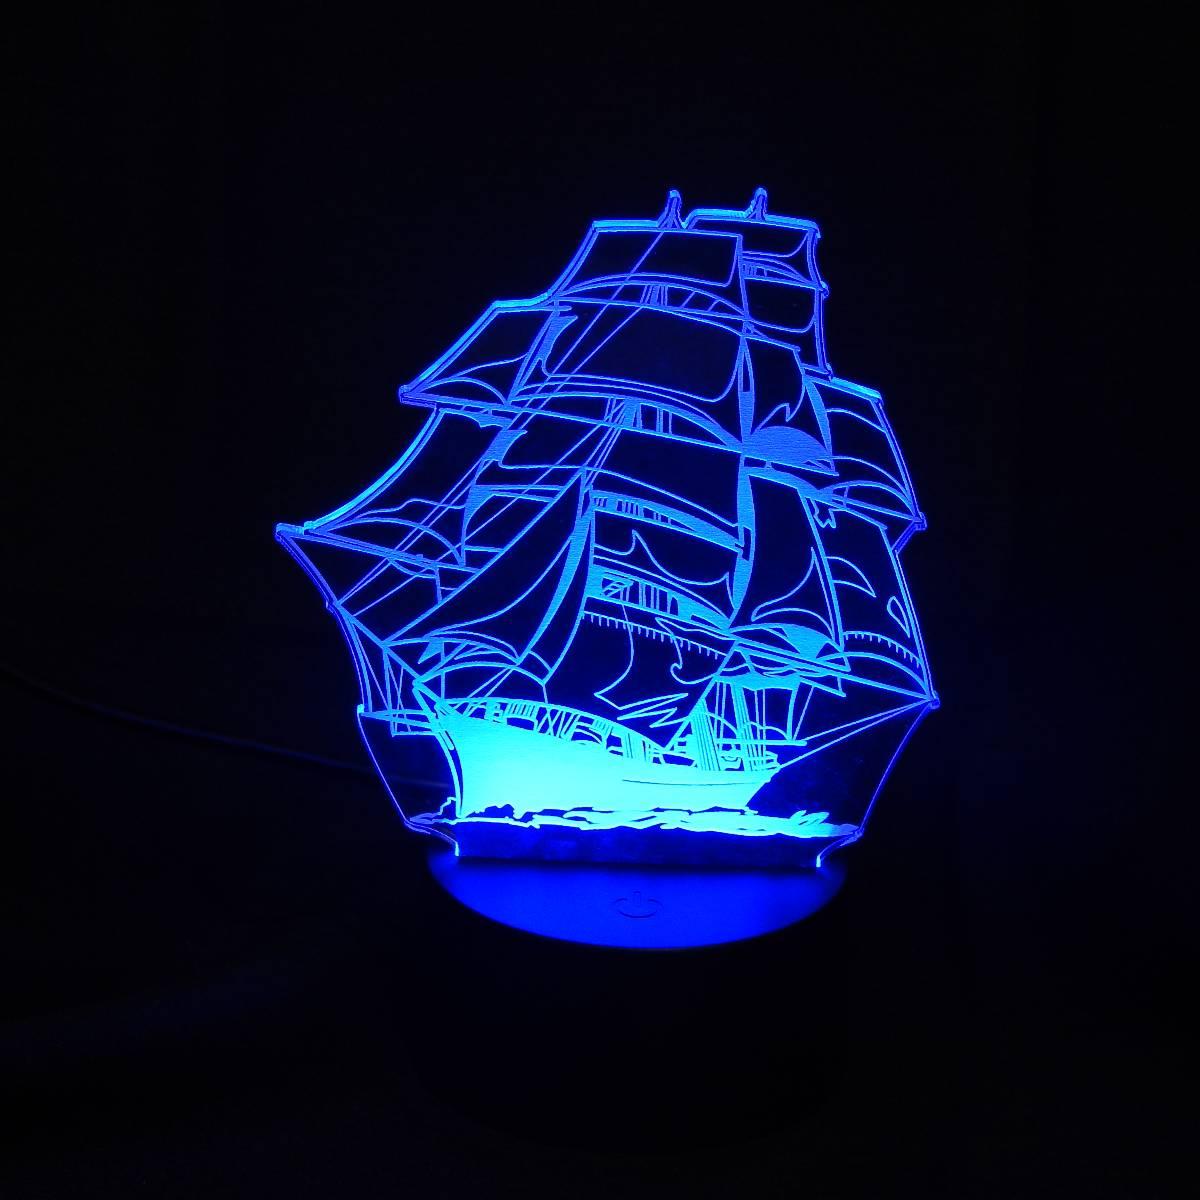 Lampu Meja Lampu Tidur Lampu Hias Kapal LED 3D Tradisional2